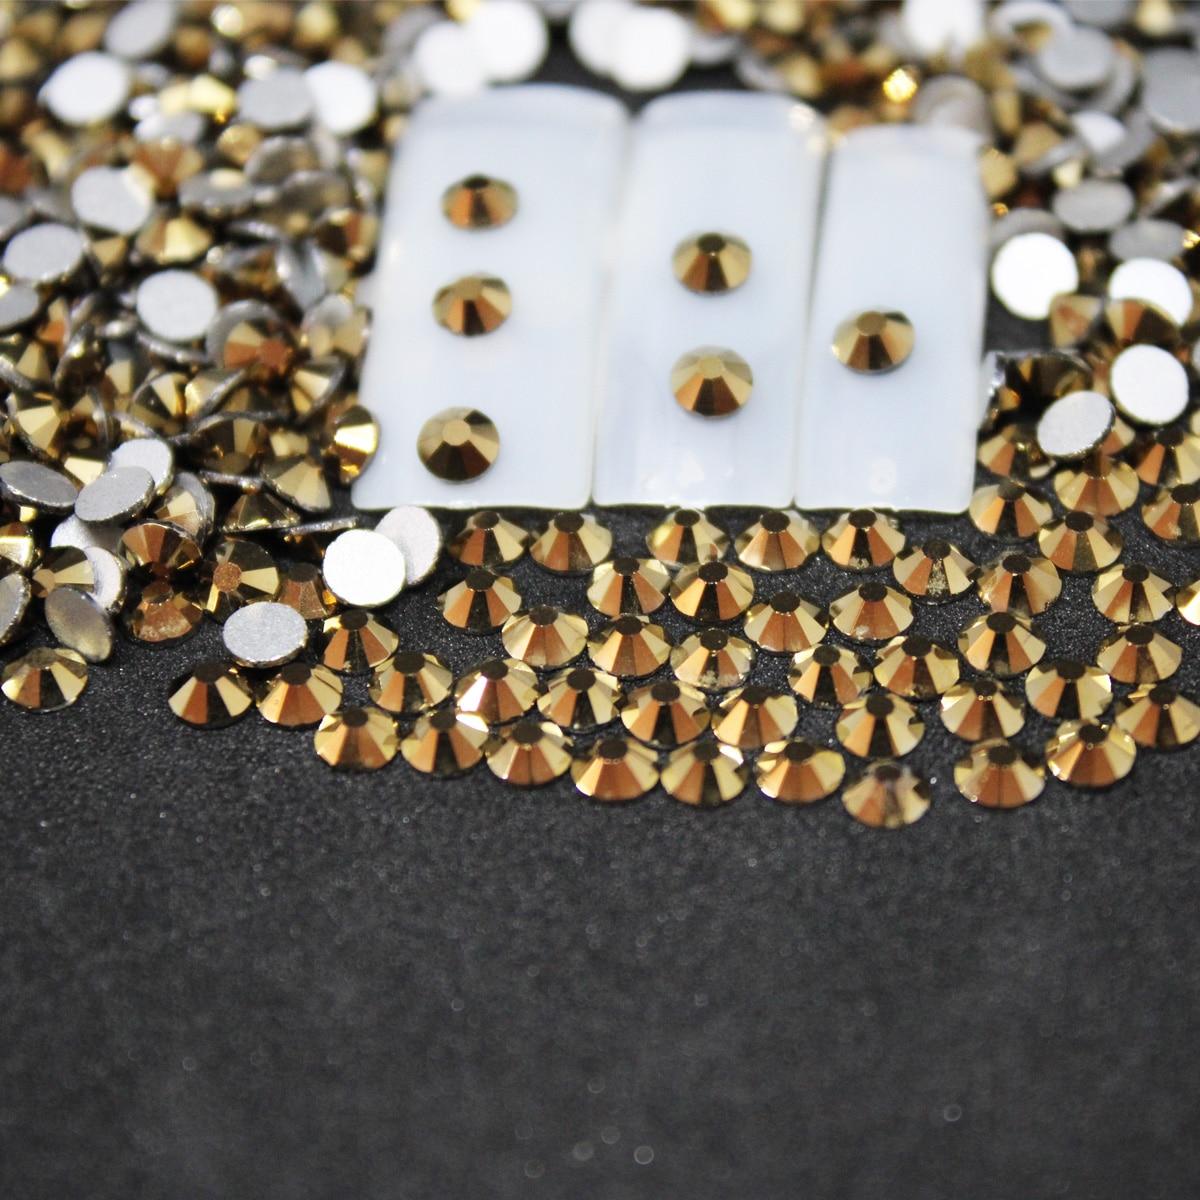 Nail gems SS3-SS10 Nail Art Decorations Rhinestones 3d nail art dekor Charm Glass Flatback nails accessoires diamonds jewelry